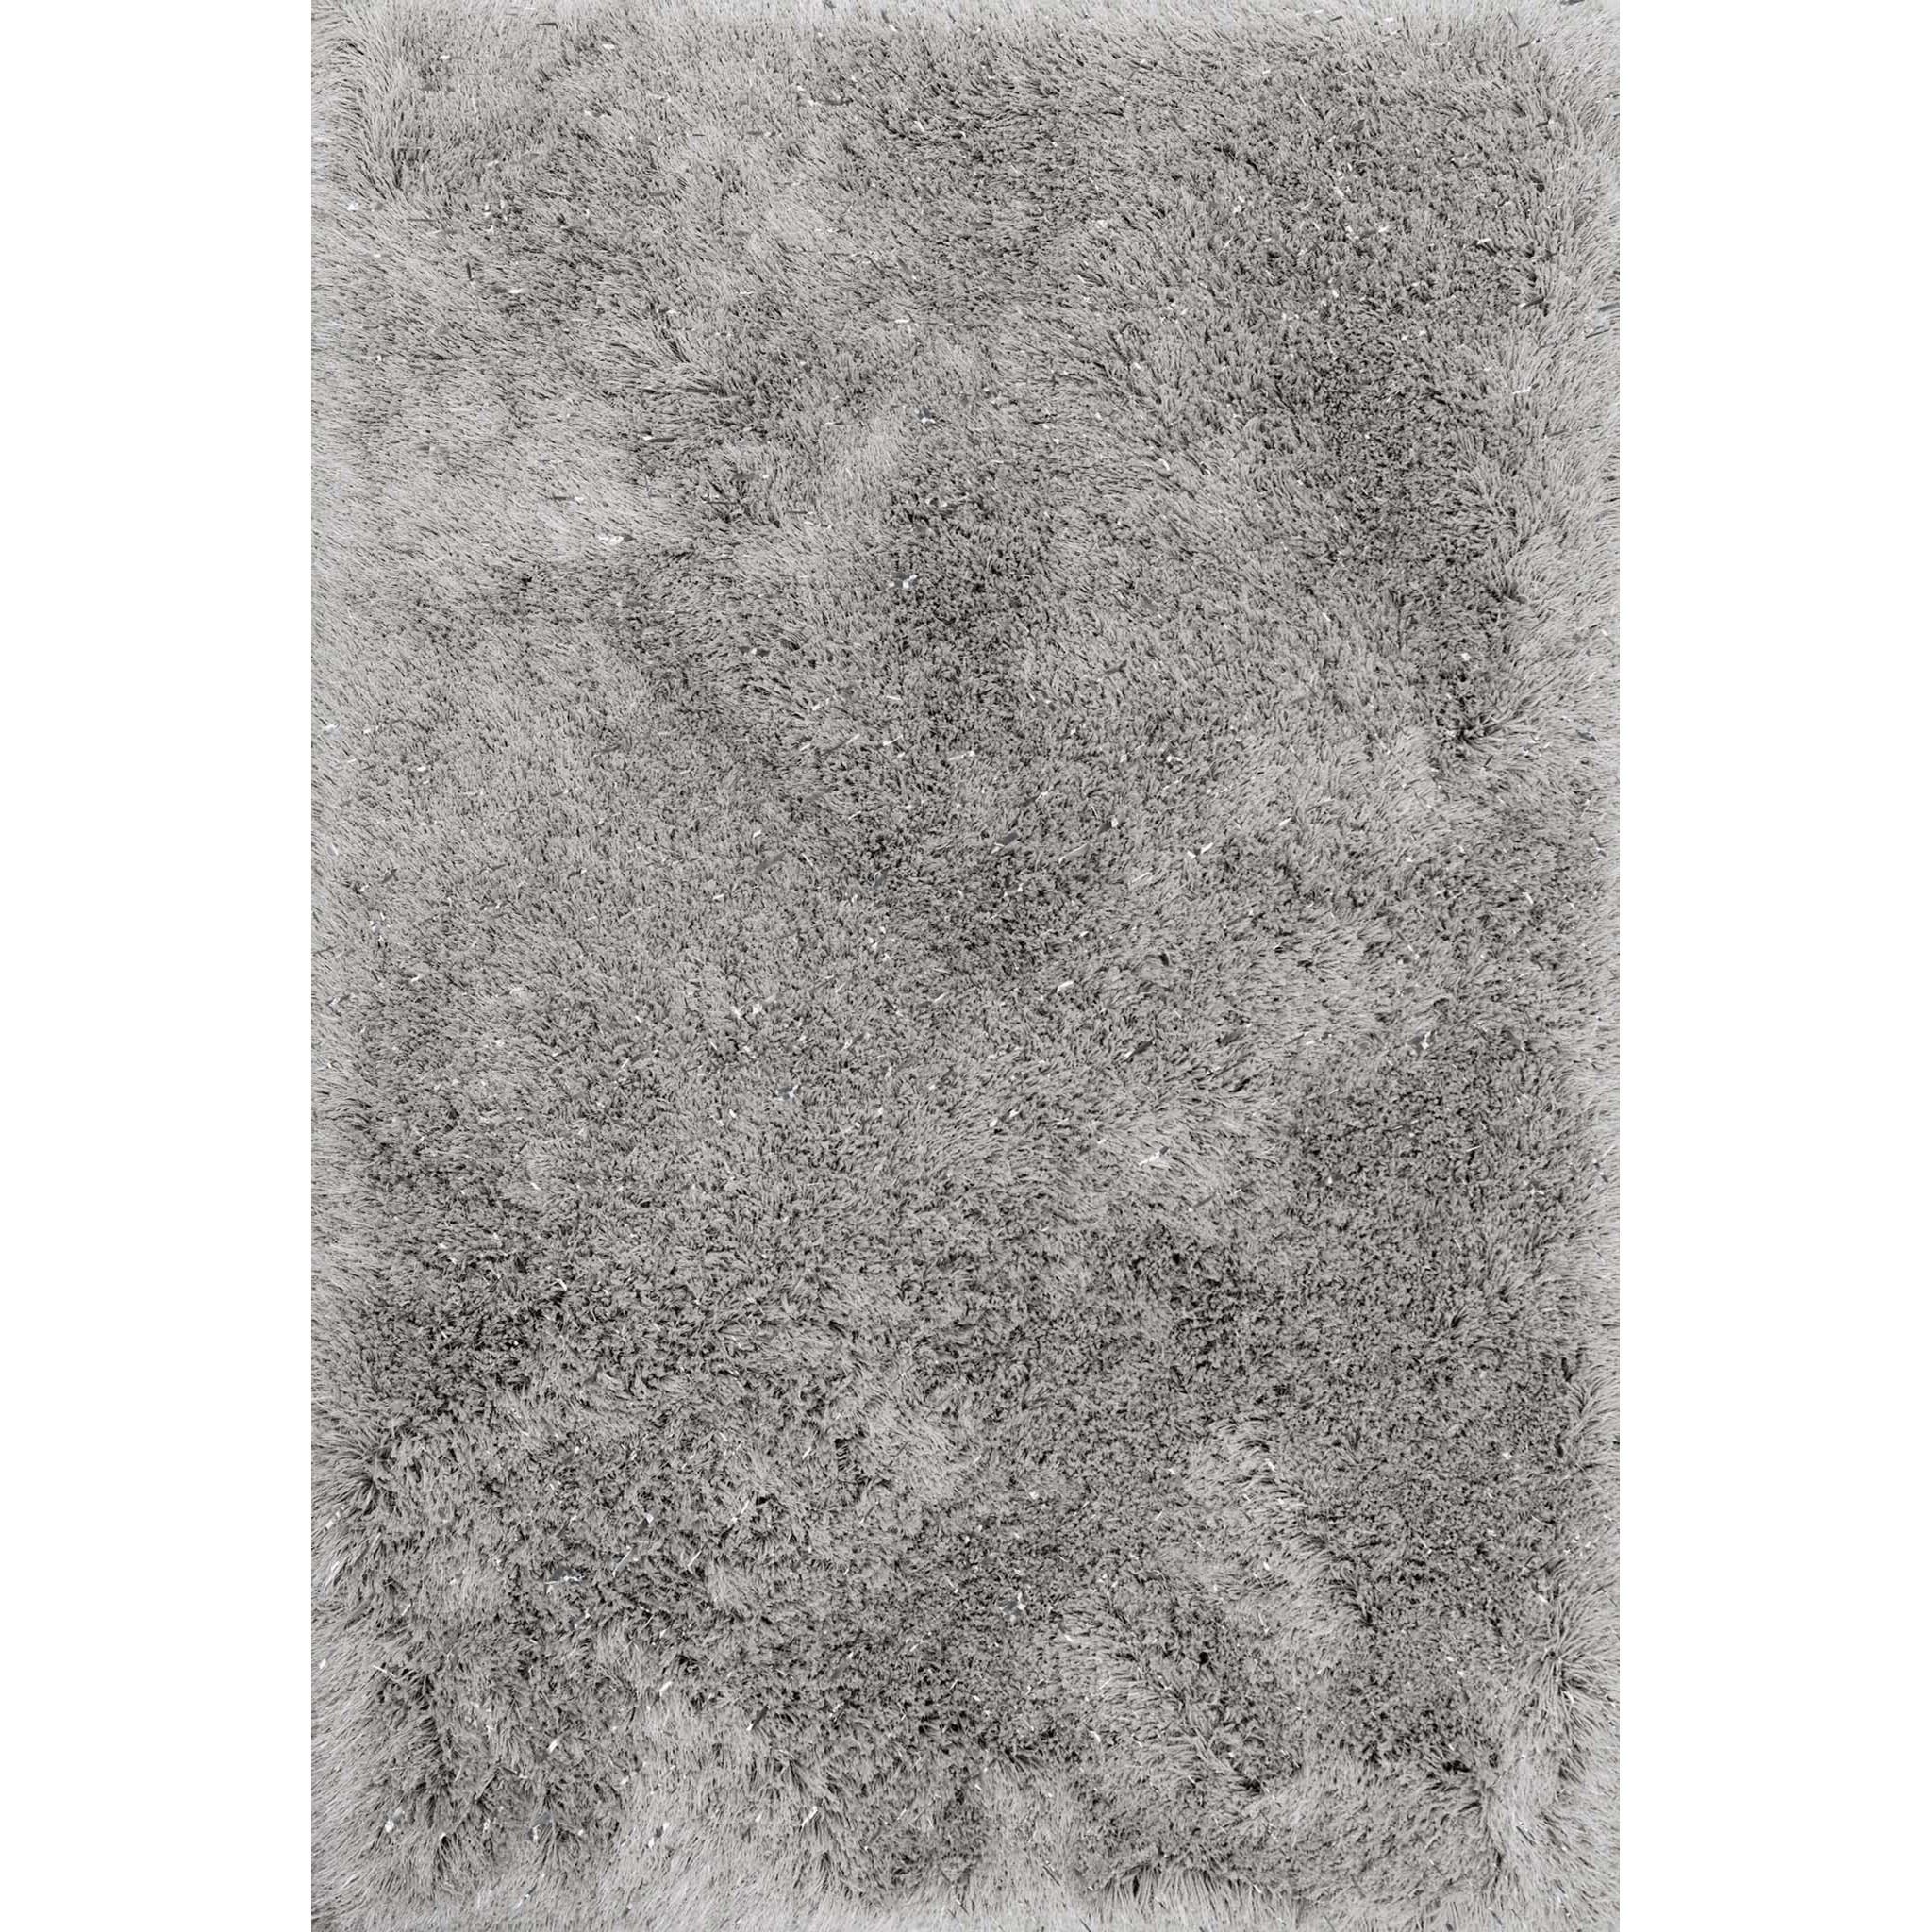 "CELESTE SHAG 5'-0"" X 7'-6"" Rug by Loloi Rugs at Virginia Furniture Market"